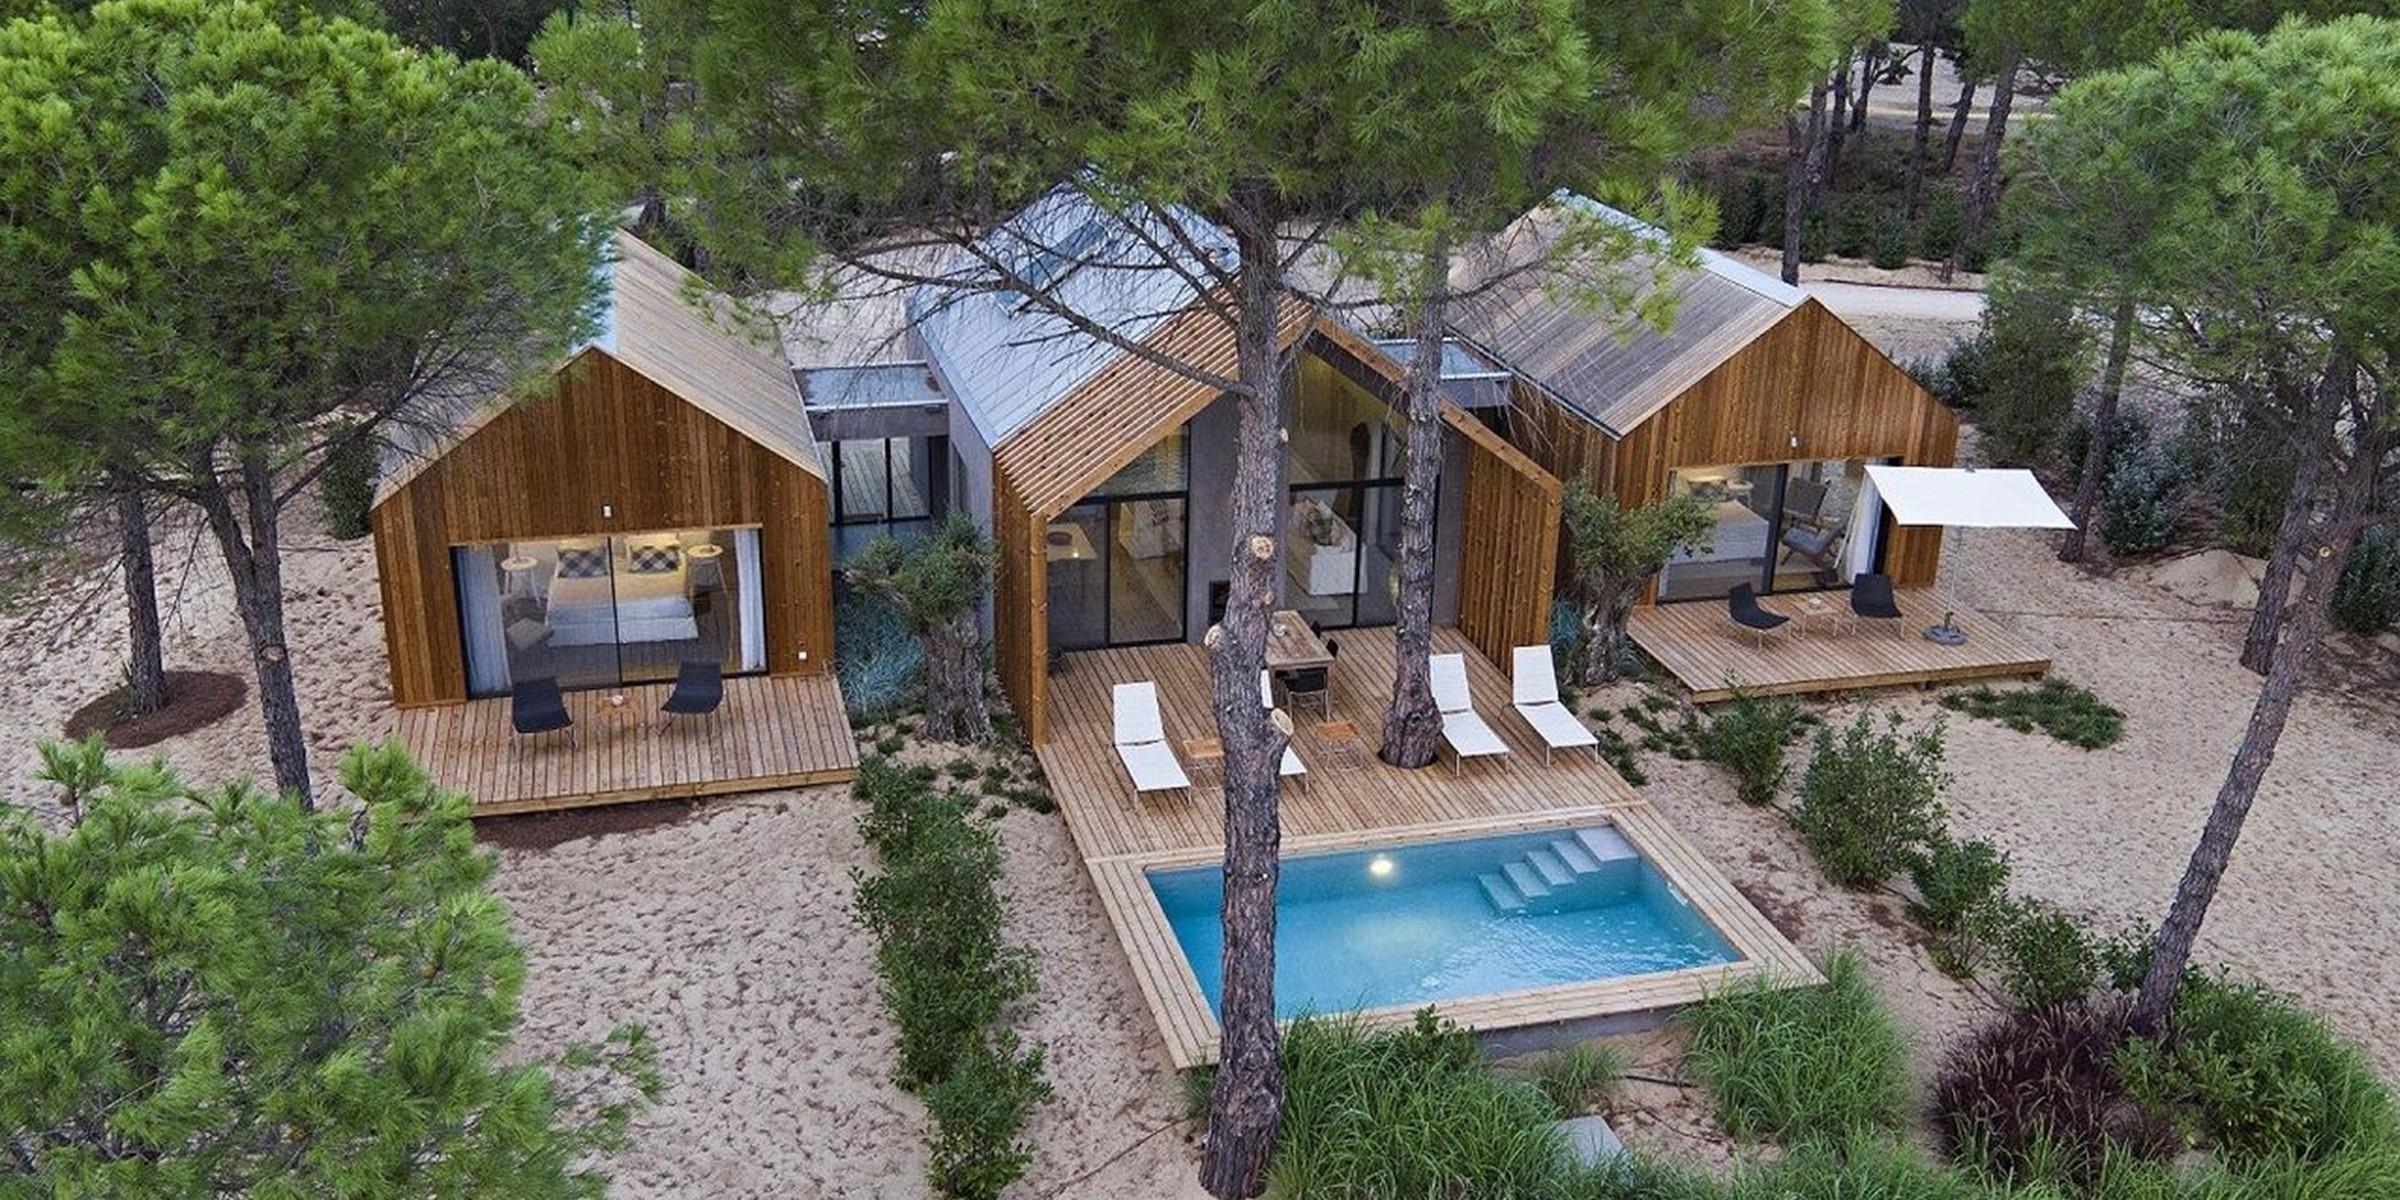 Sublime Comporta Country Retreat And Spa Galleryvillas Sublime Comporta 2 Bedroom Villa Air View Nelson Garrido2